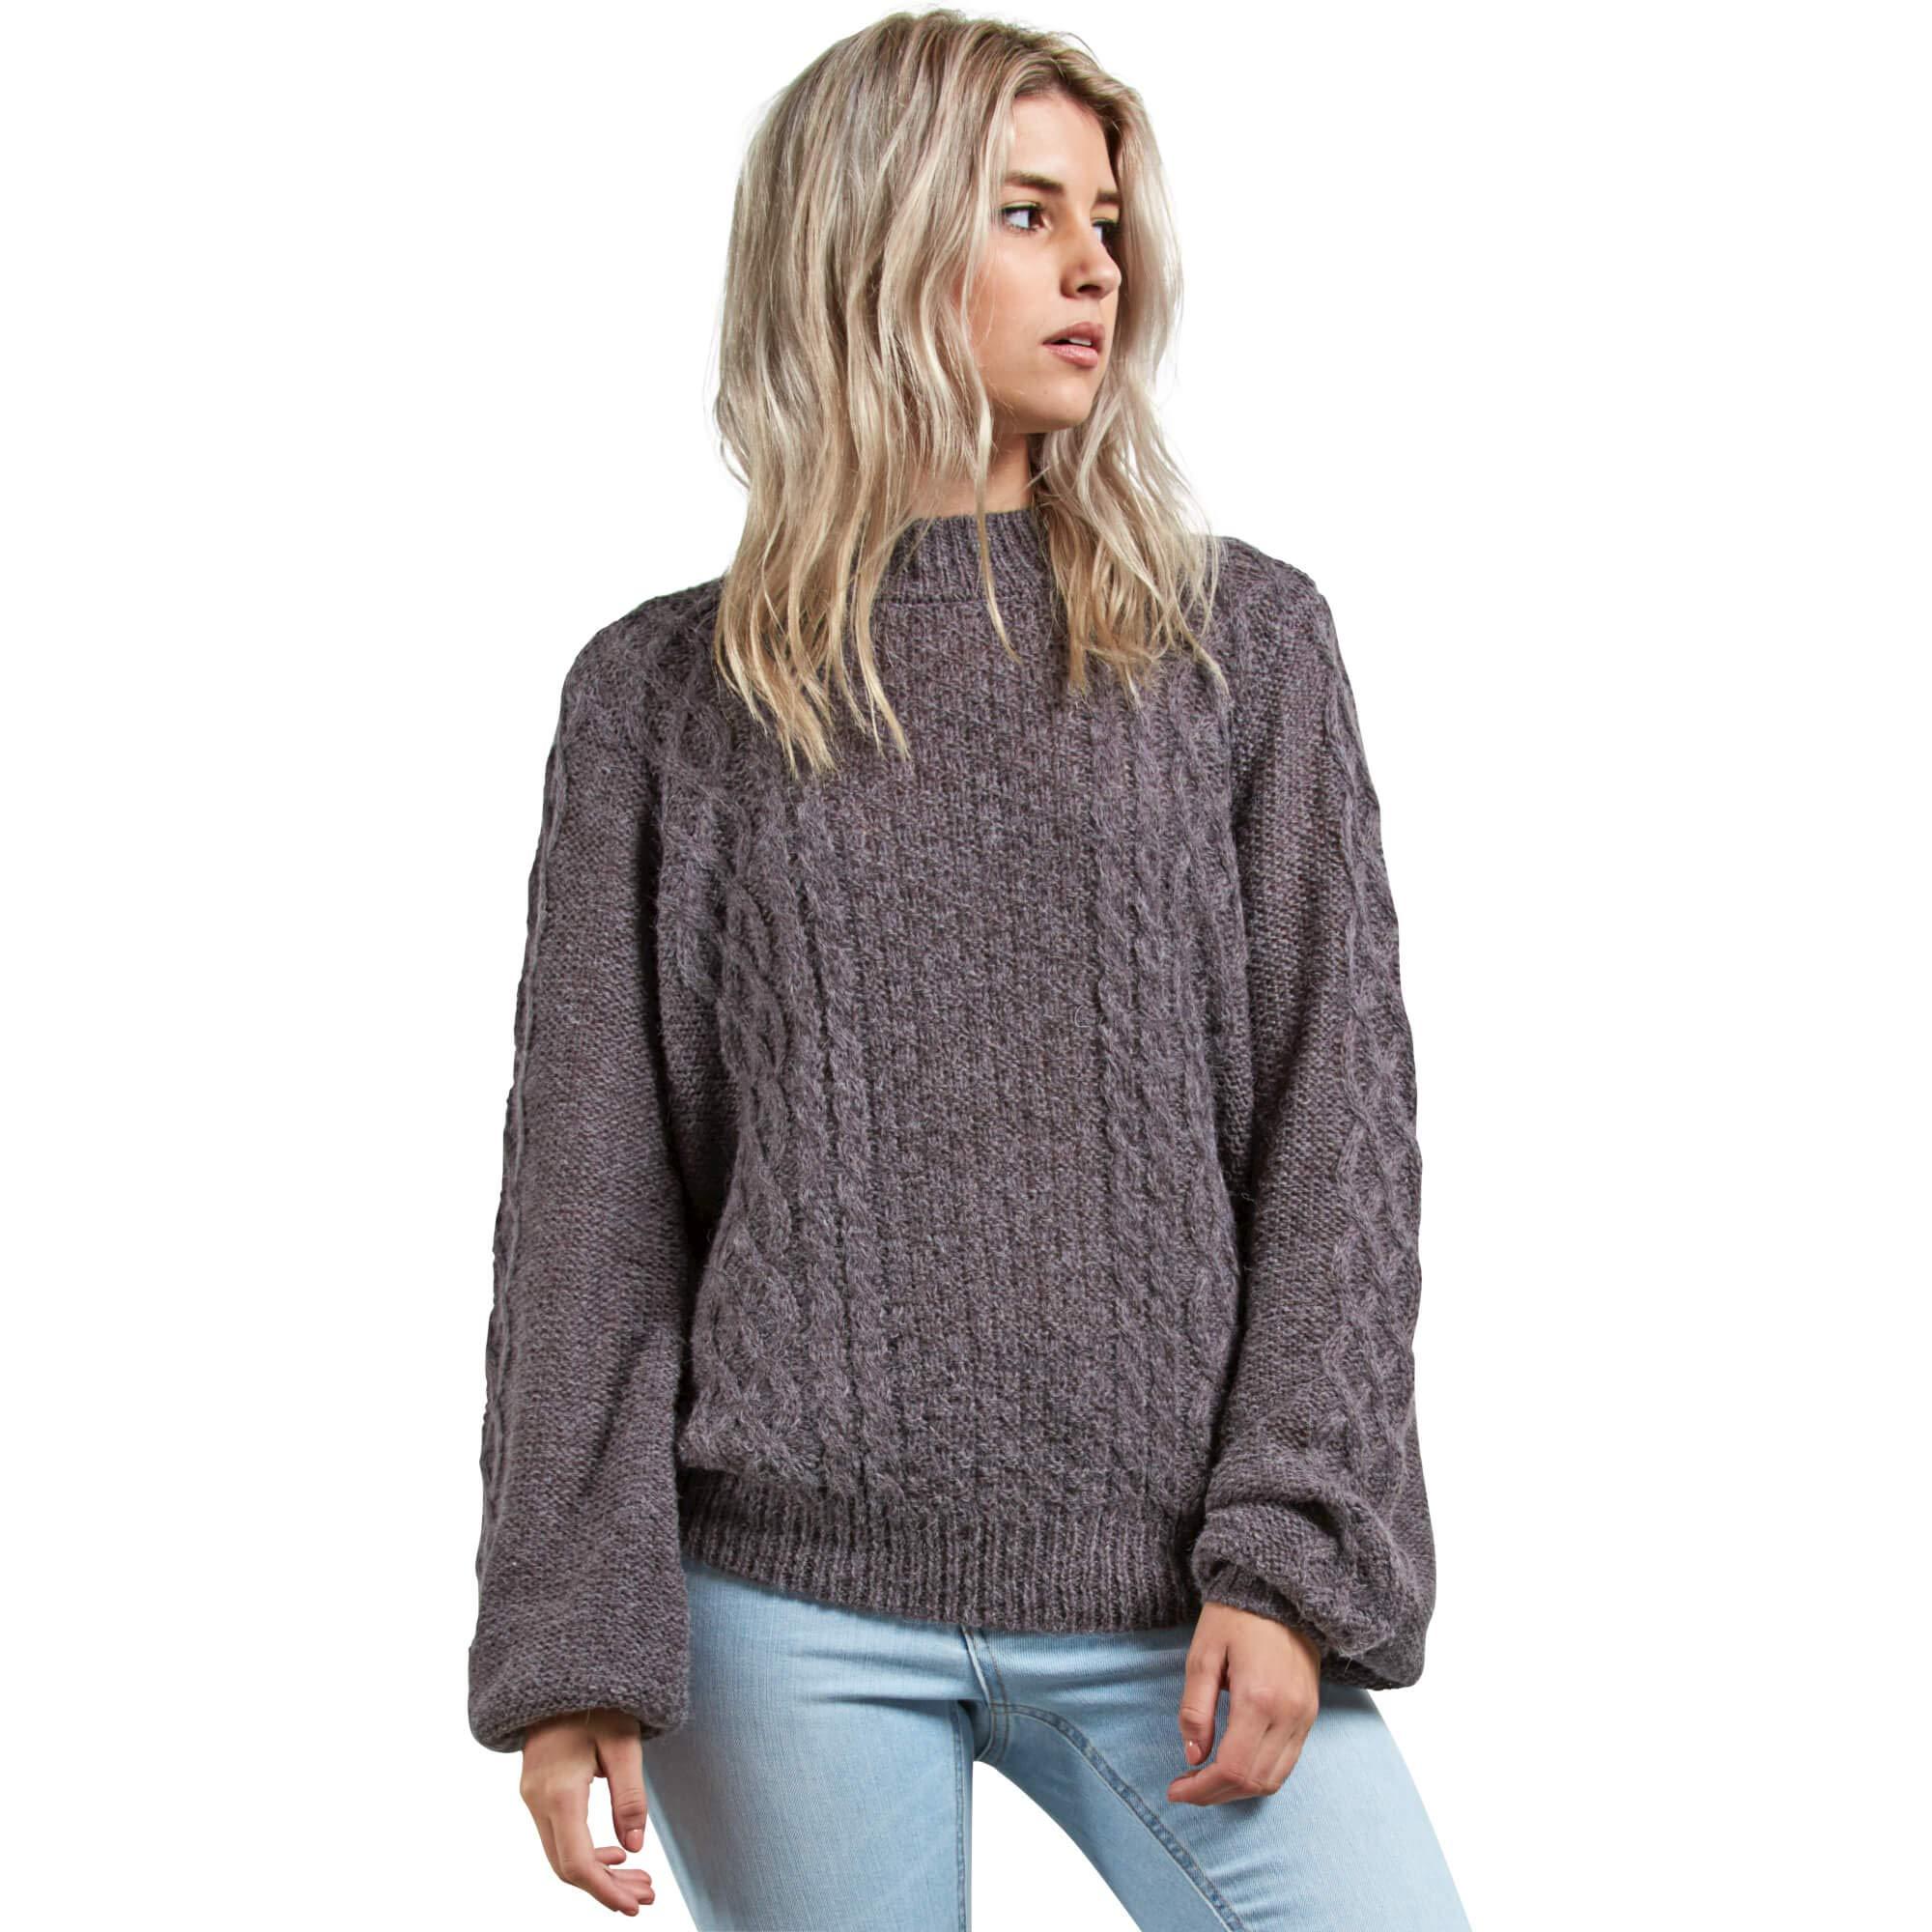 Volcom Junior's Hellooo Soft Fuzzy Pullover Crew Neck Sweater, Heather Grey, Large